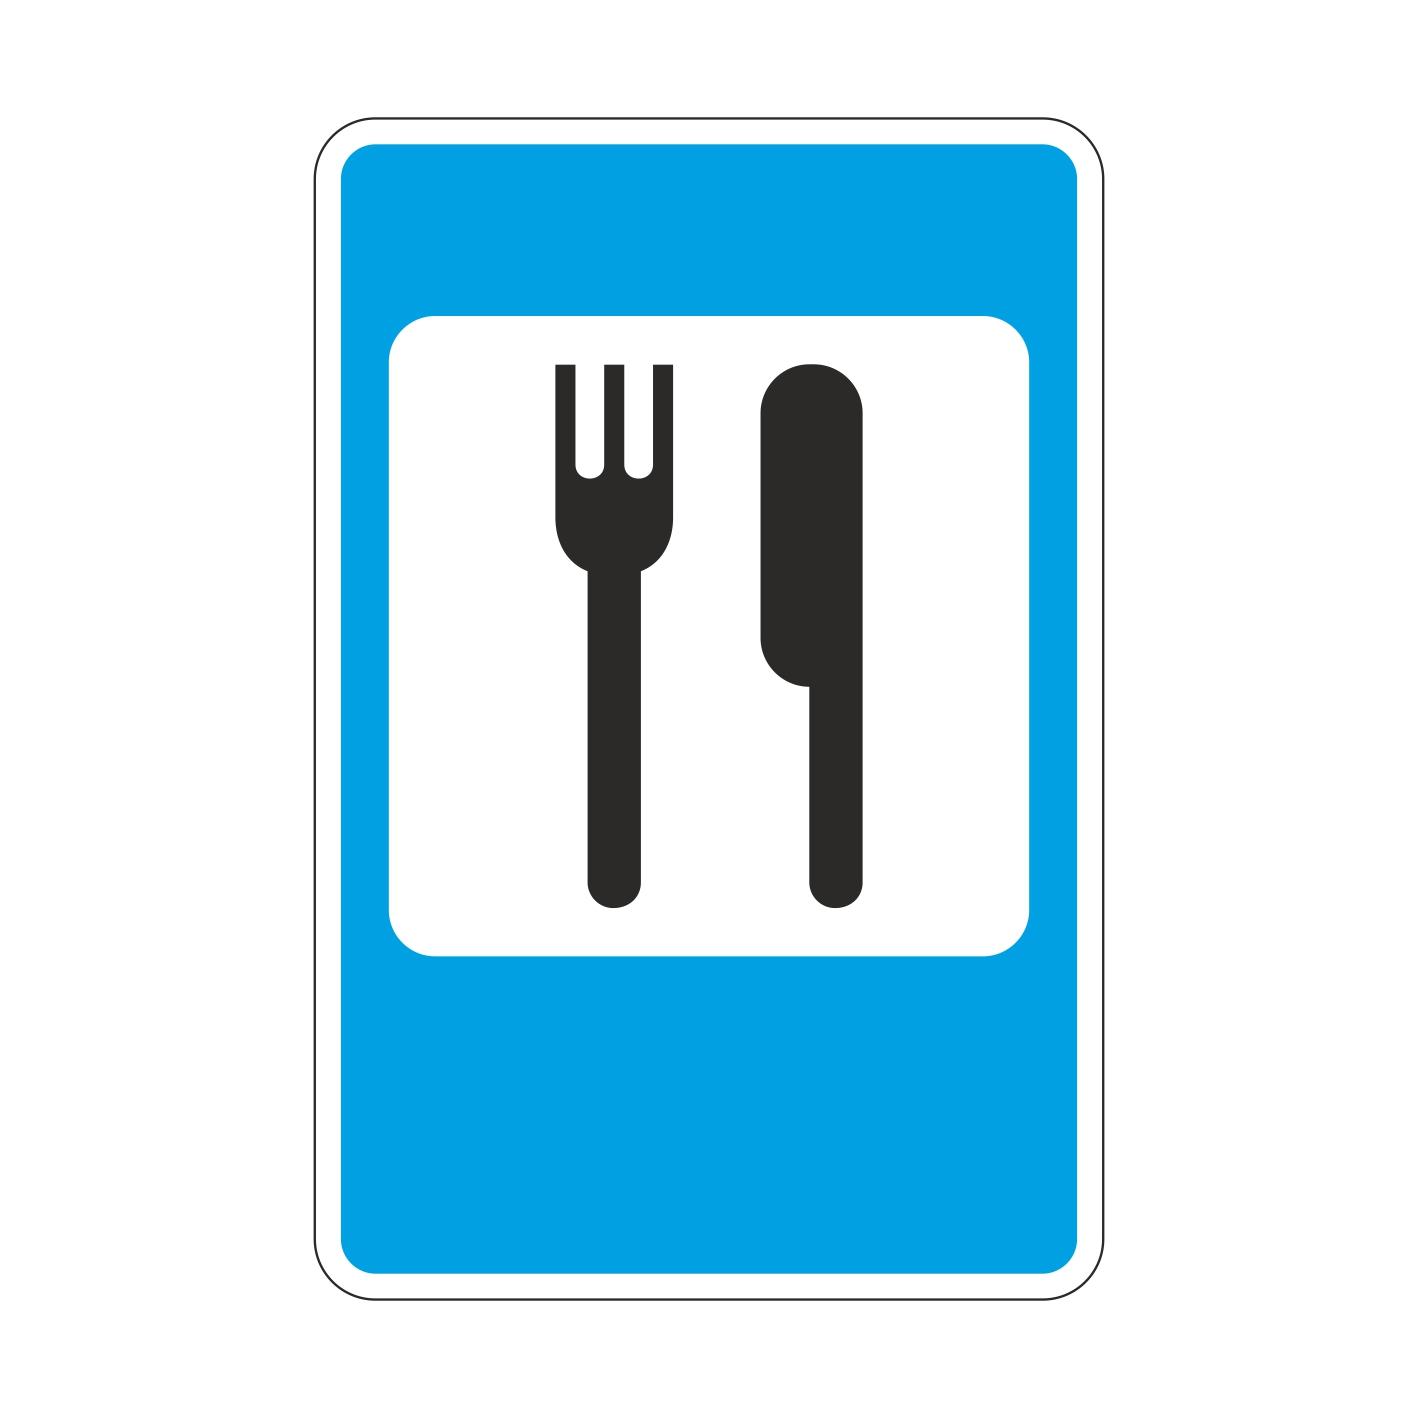 7.7 Пункт питания